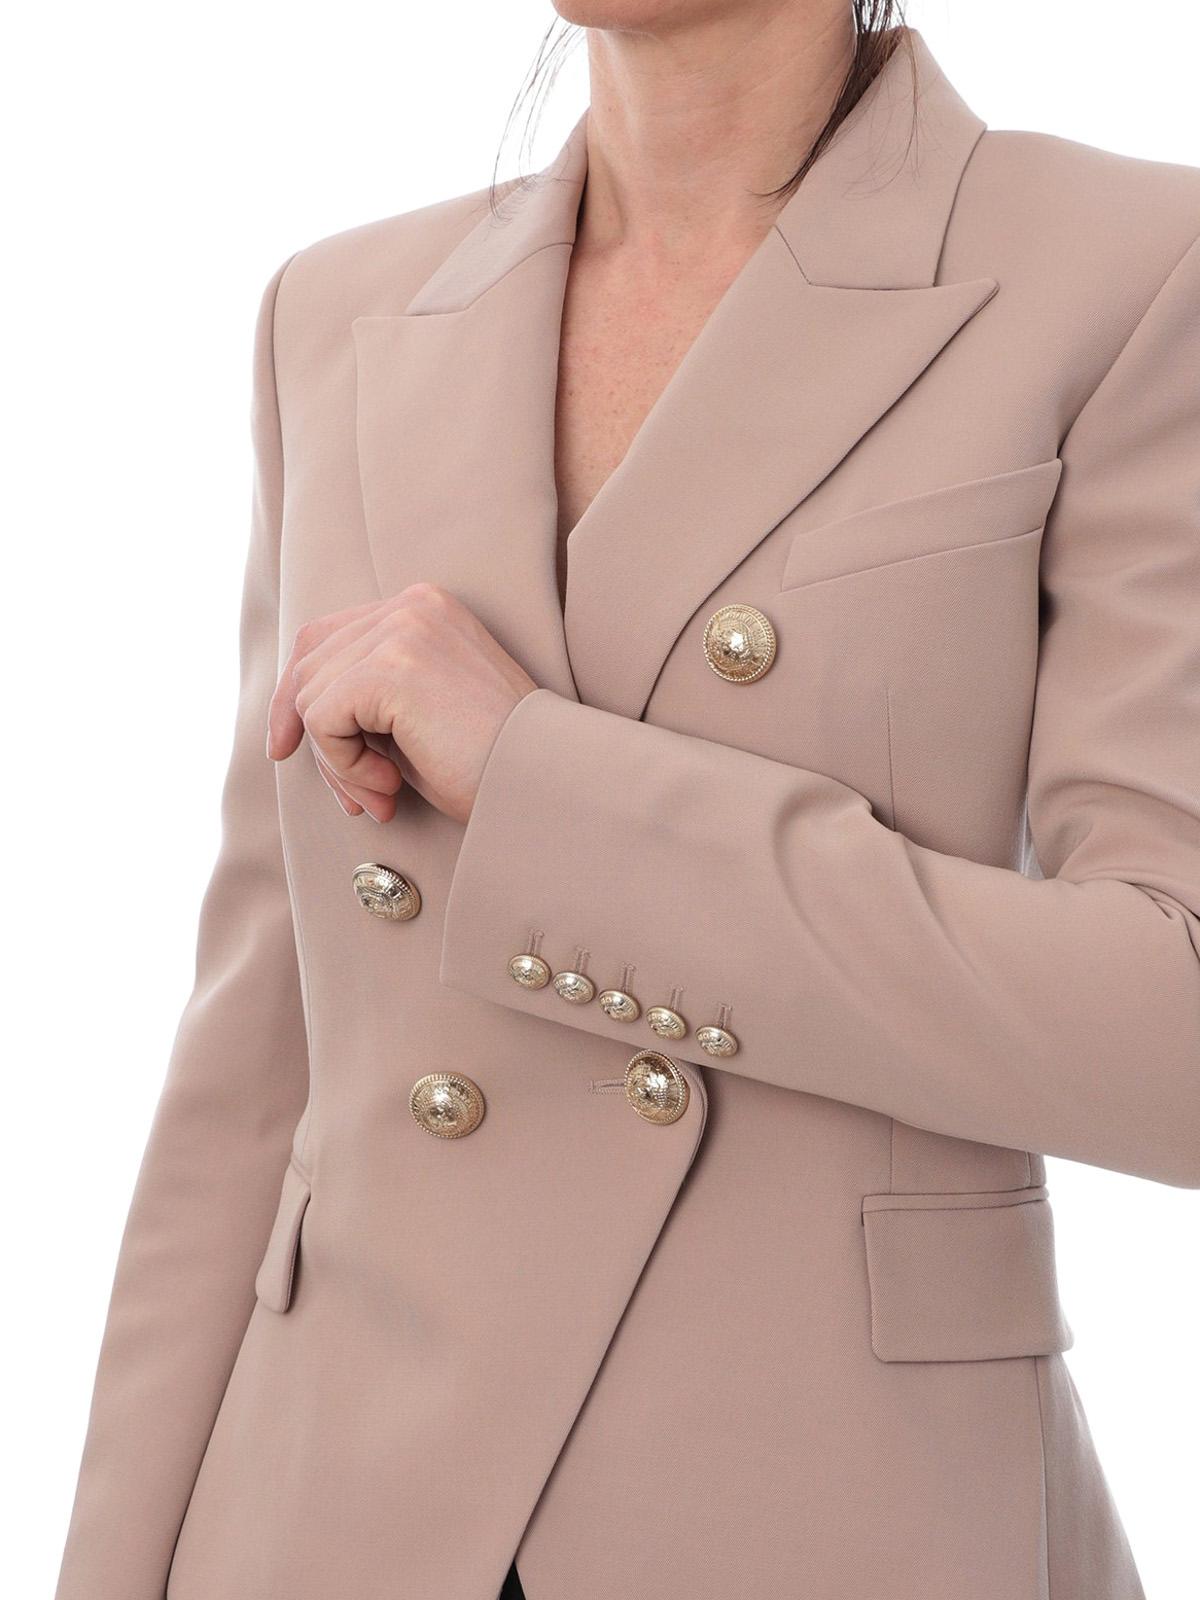 Balmain Giacca iconica in lana con bottoni dorati giacche